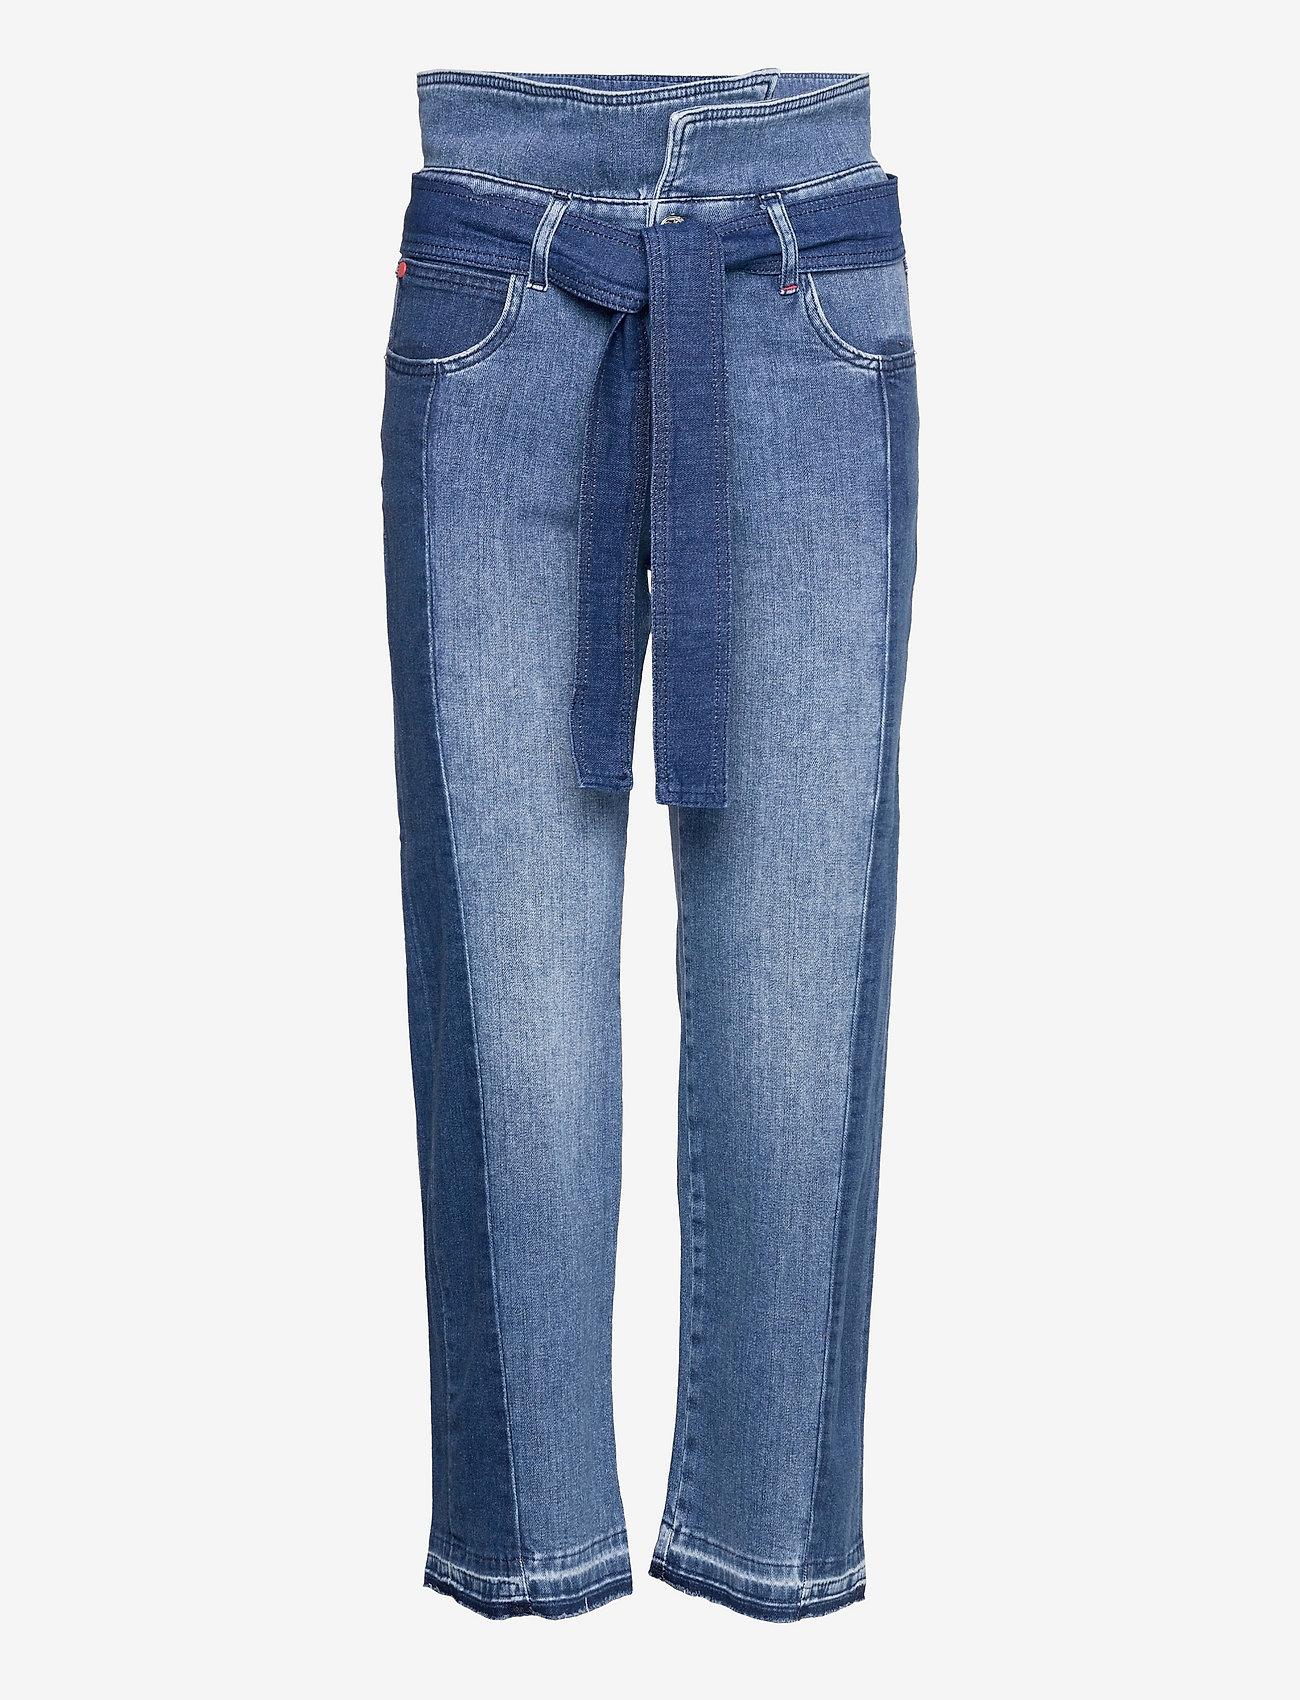 Max&Co. - FESTIVO - straight jeans - midnight blue - 0